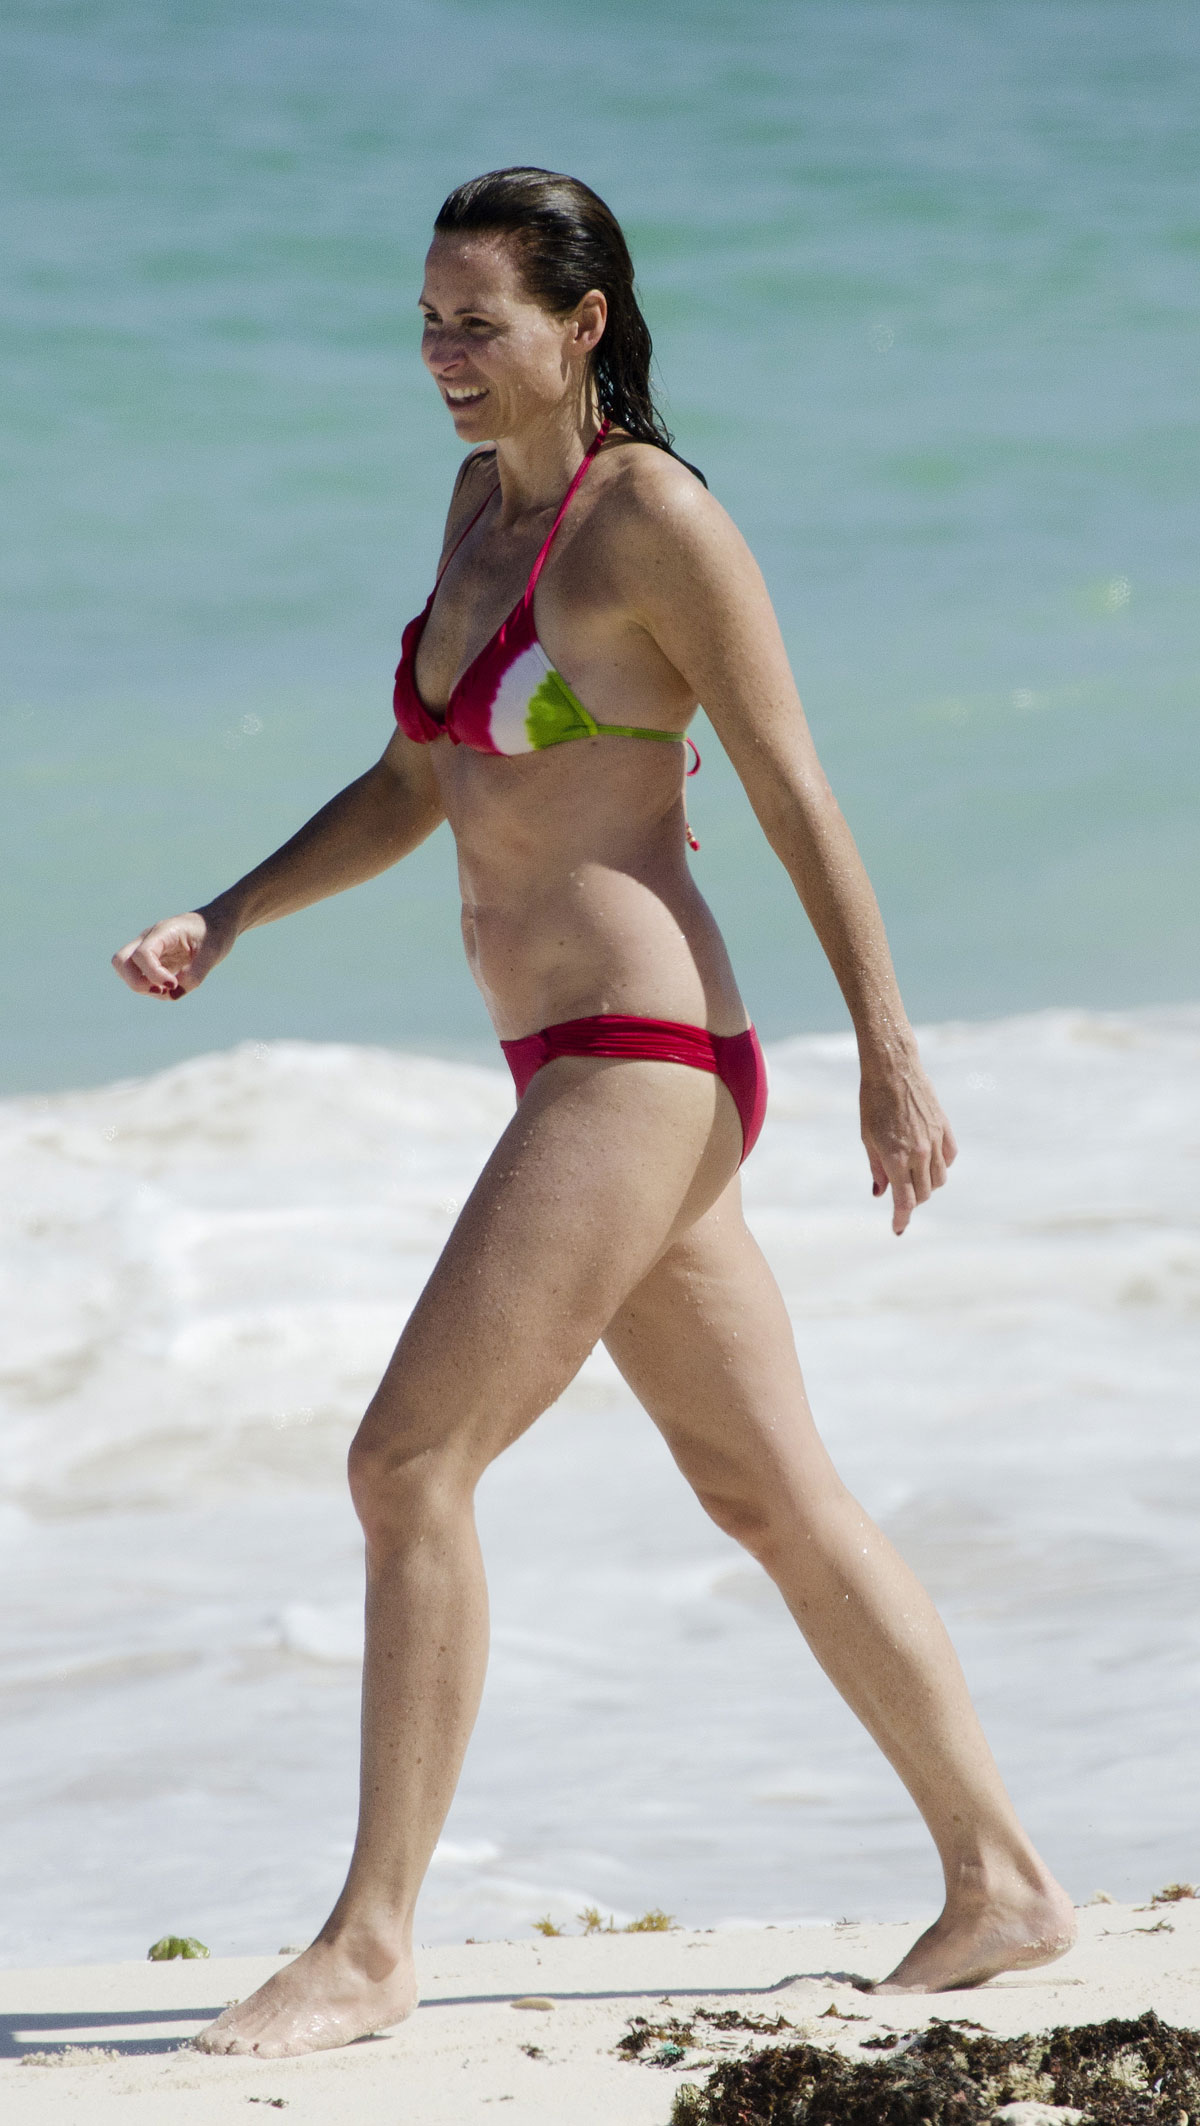 Bikini Minnie Driver nude (82 photo), Ass, Is a cute, Selfie, swimsuit 2017